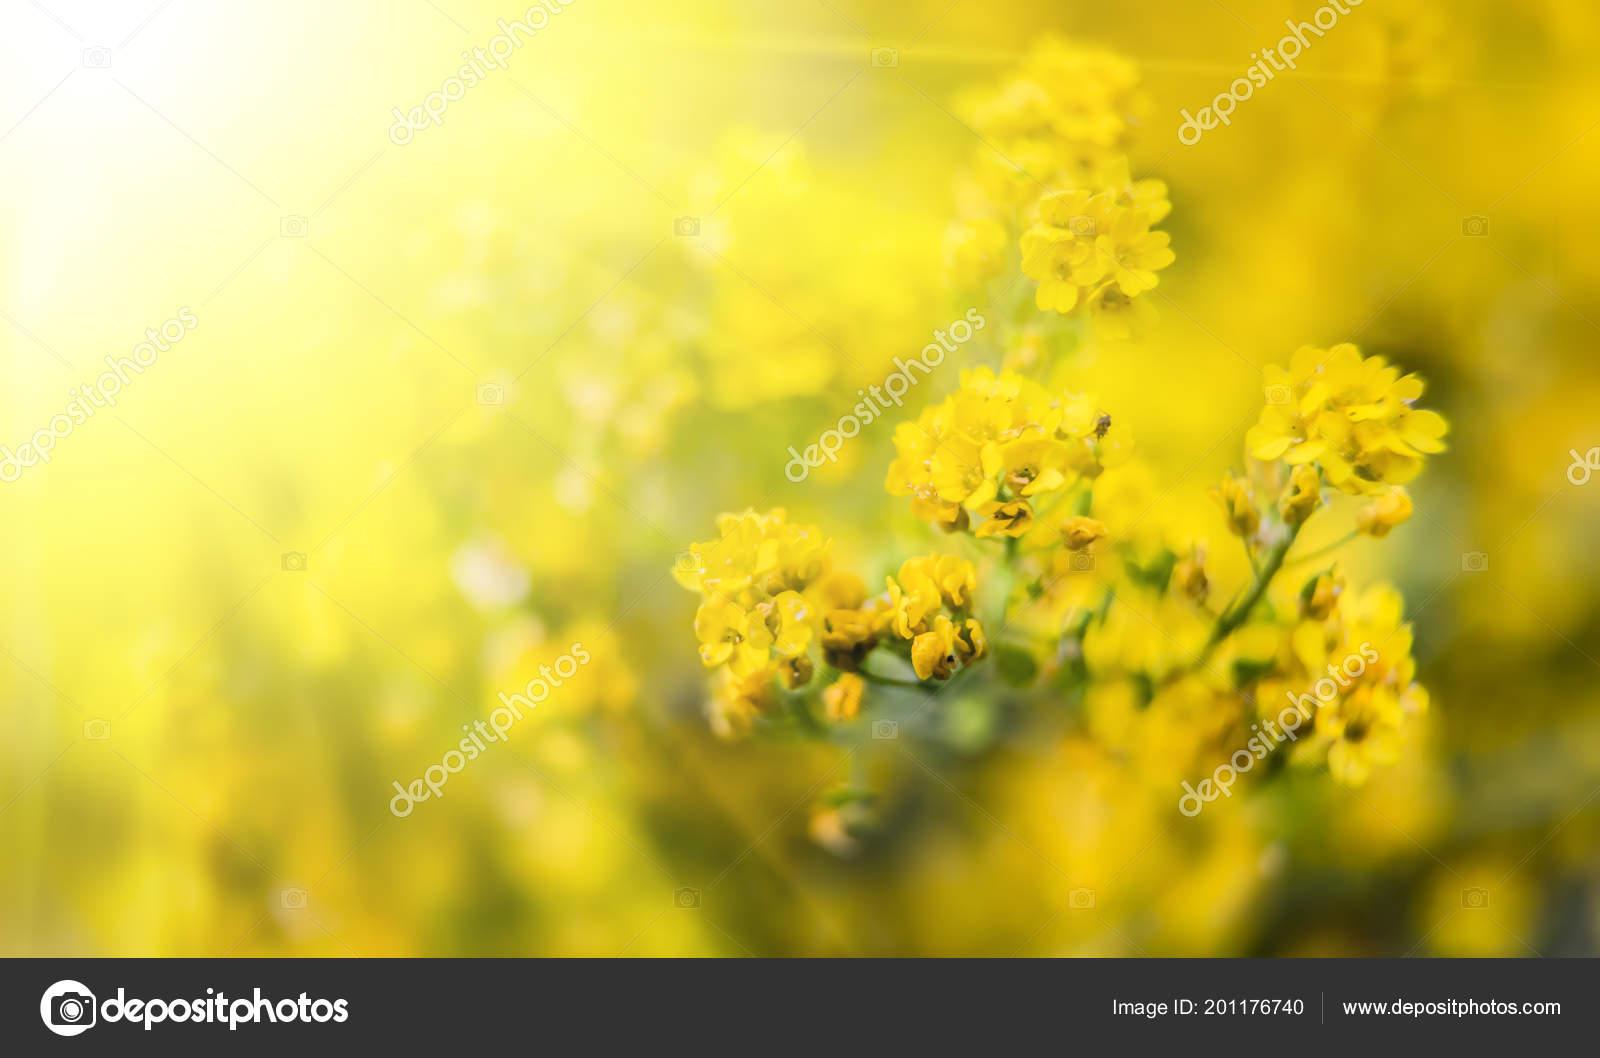 Soft Focus Image Small Yellow Flowers Aurinia Saxatilis Sun Light